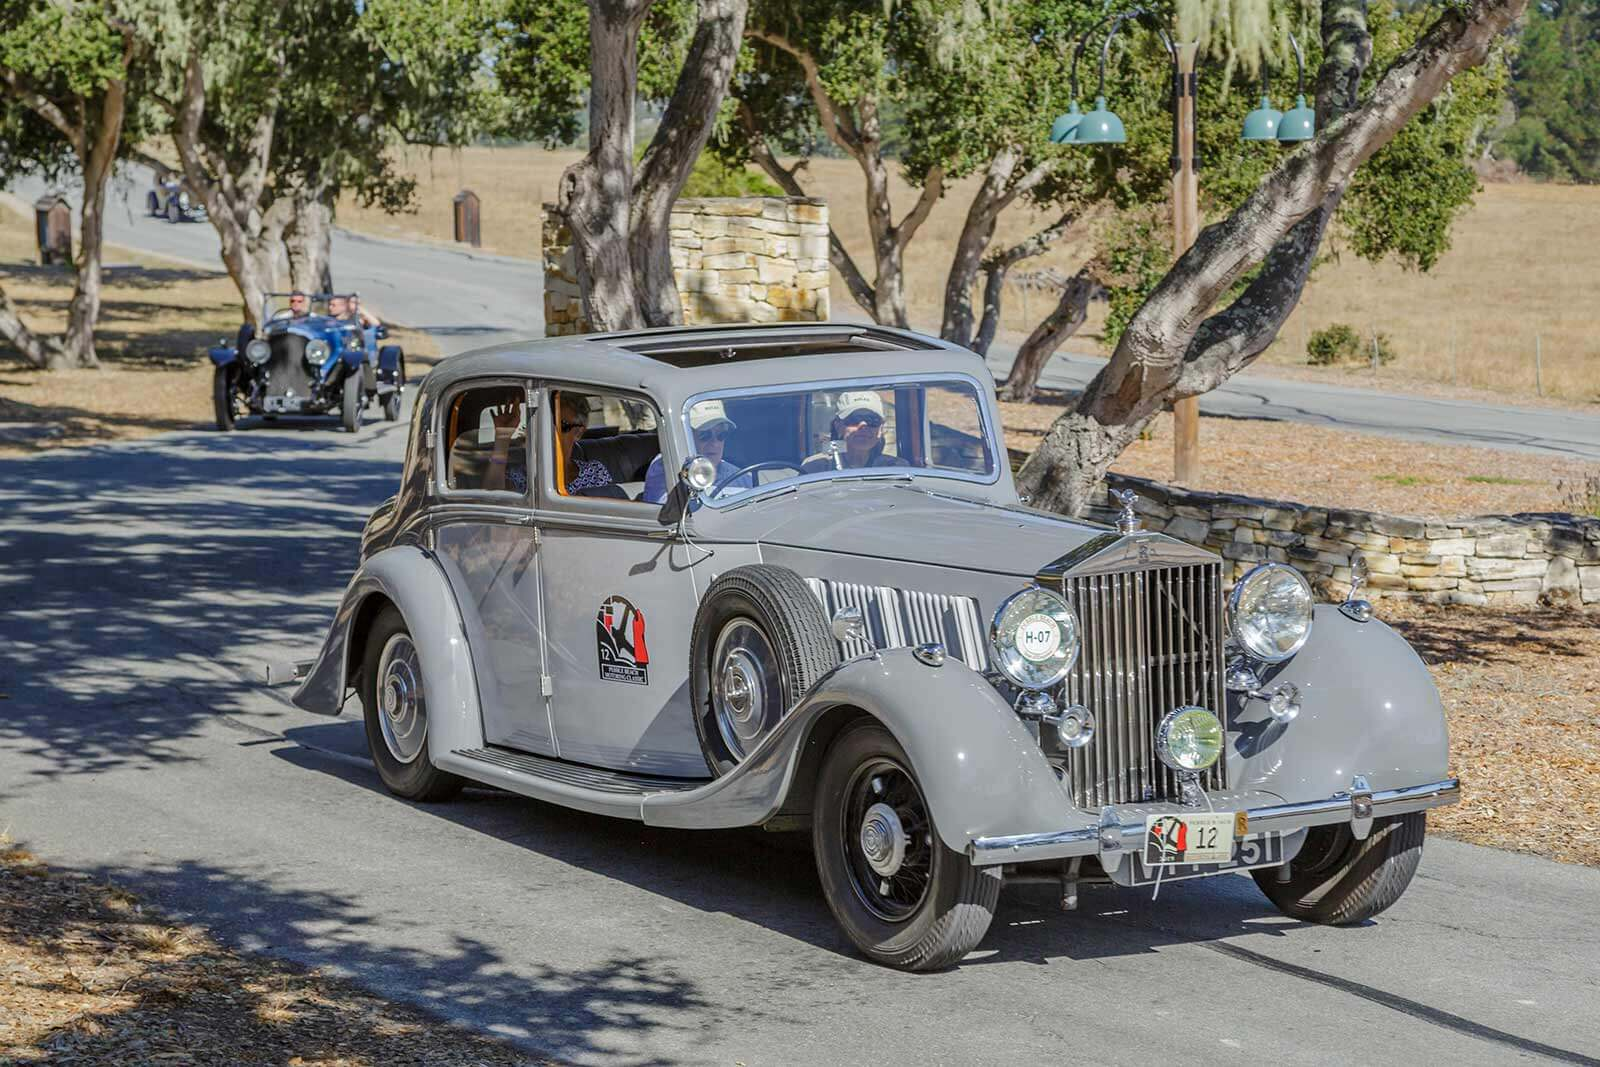 The Pebble Beach Tour d'Elegance driving through Tehama in Carmel, CA.